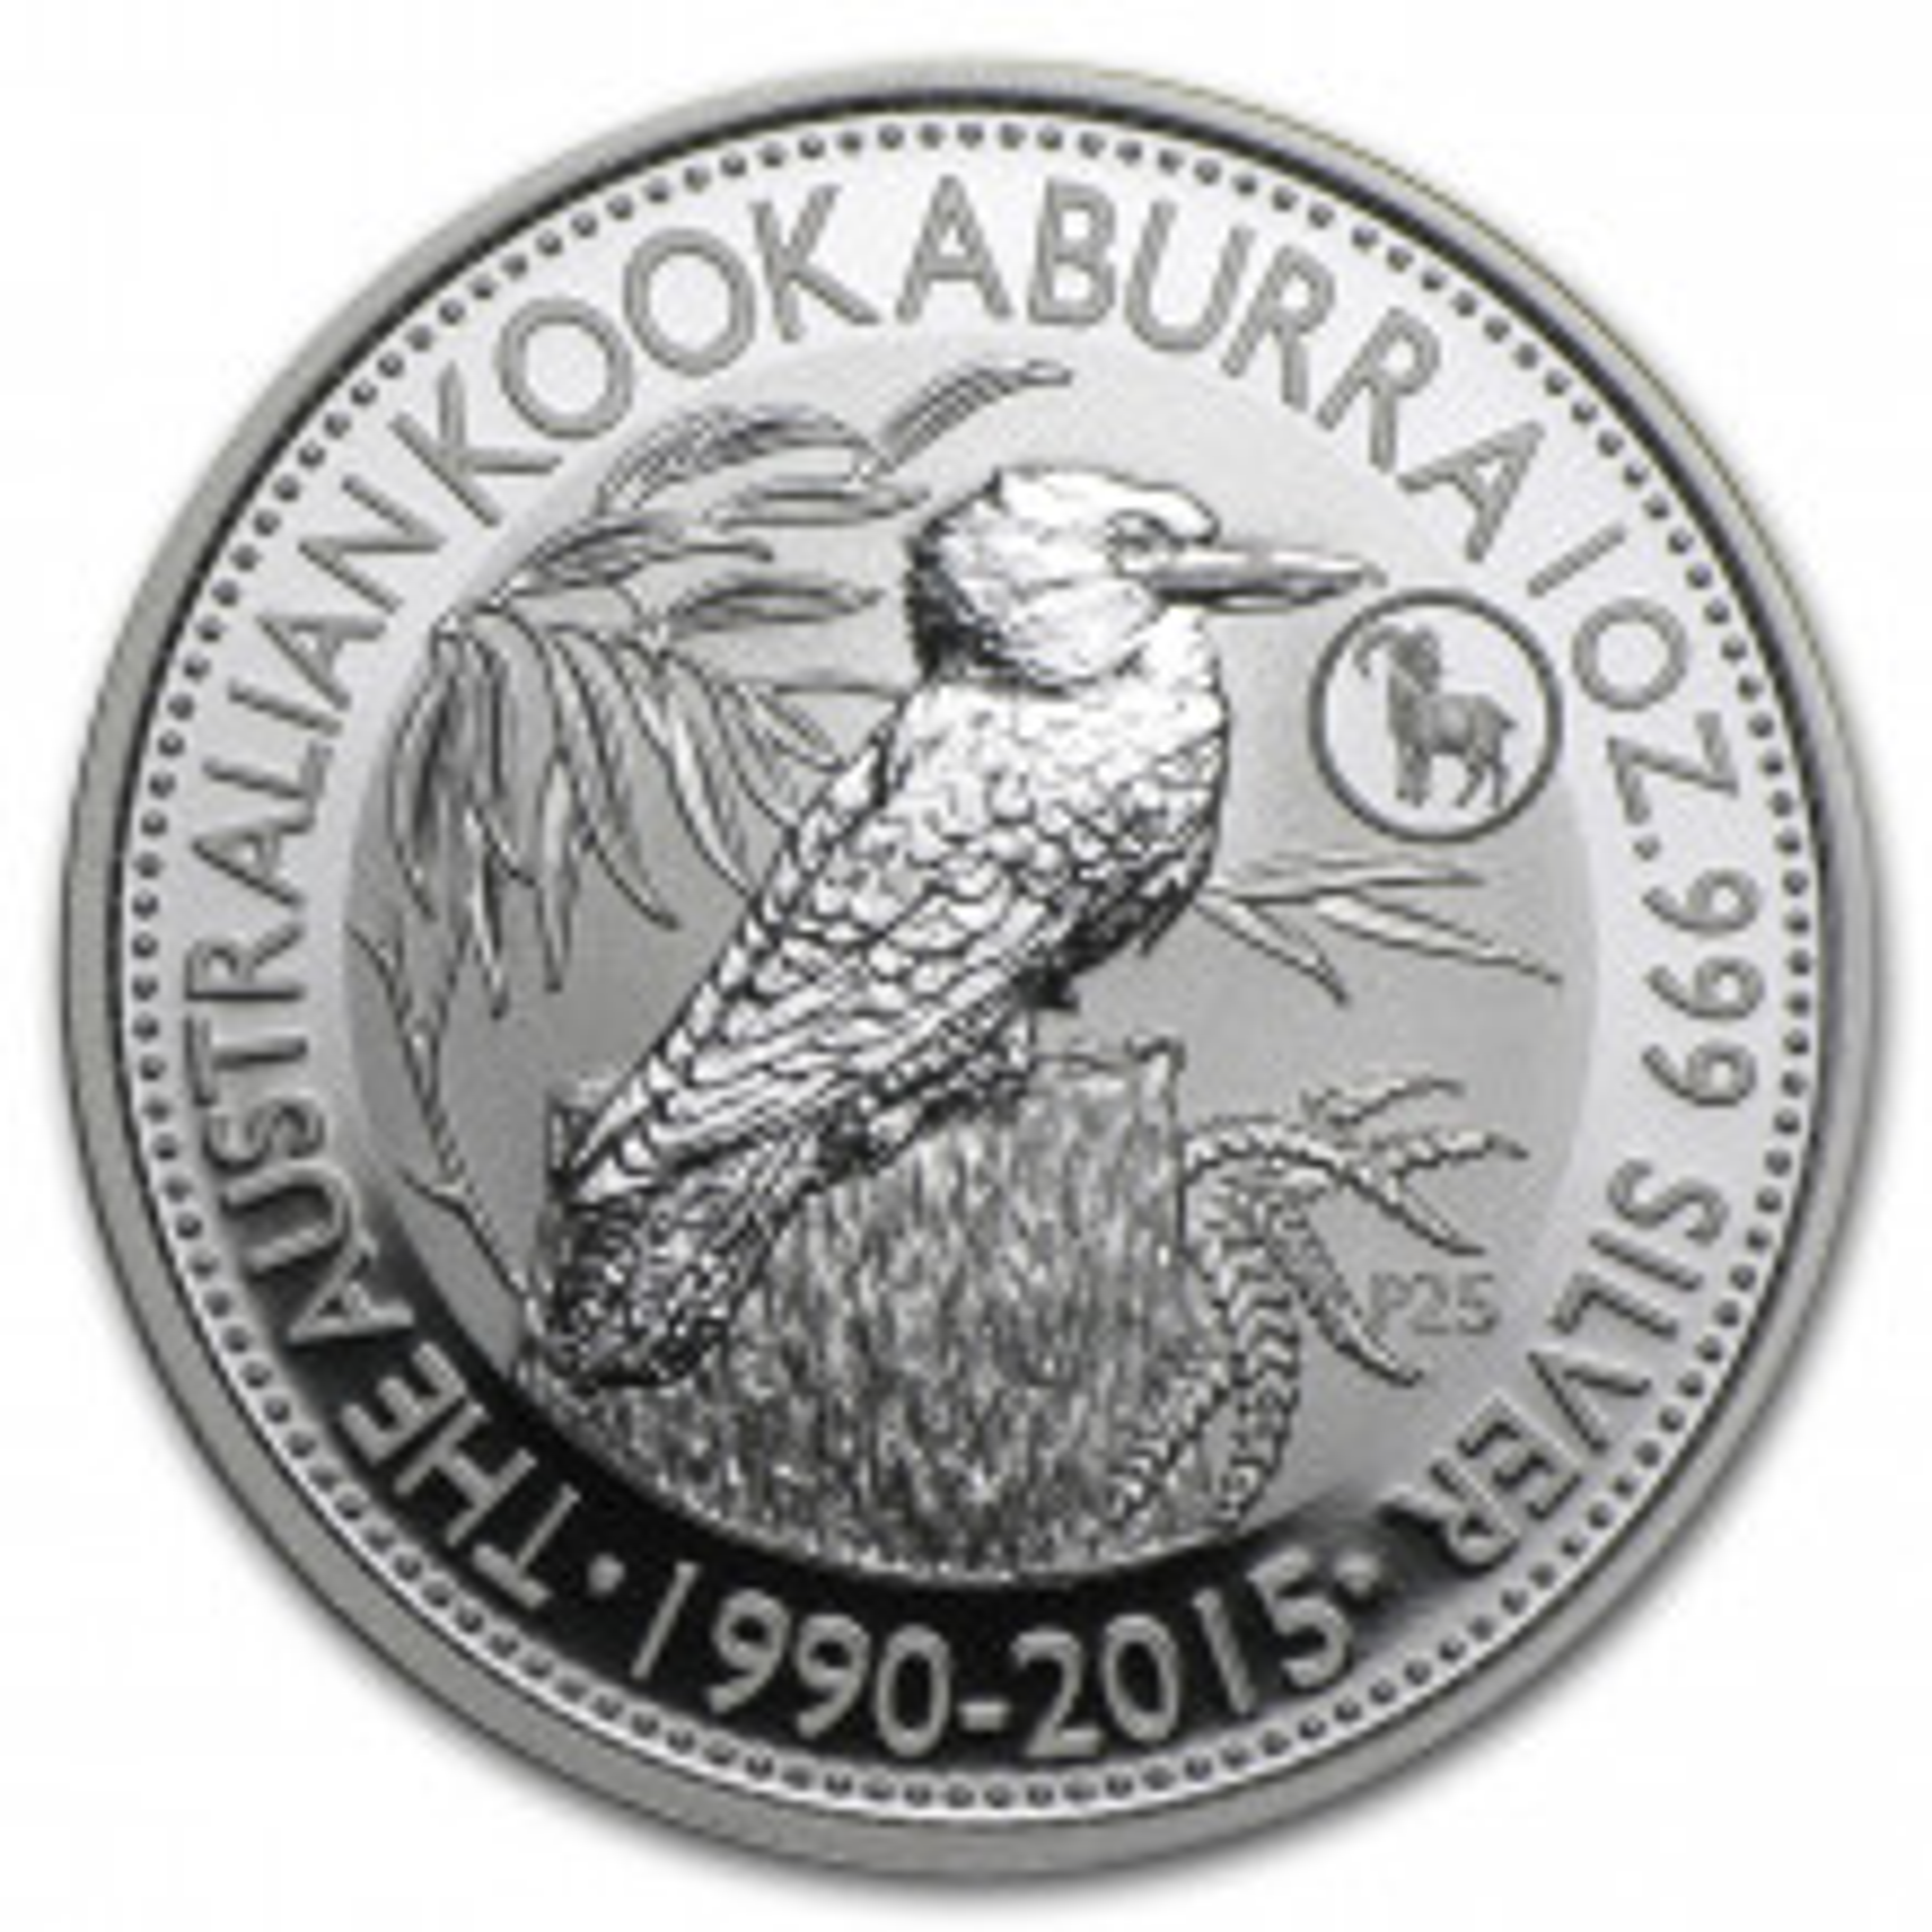 1 troy ounce silver coin Kookaburra (Goat Privy) 2015